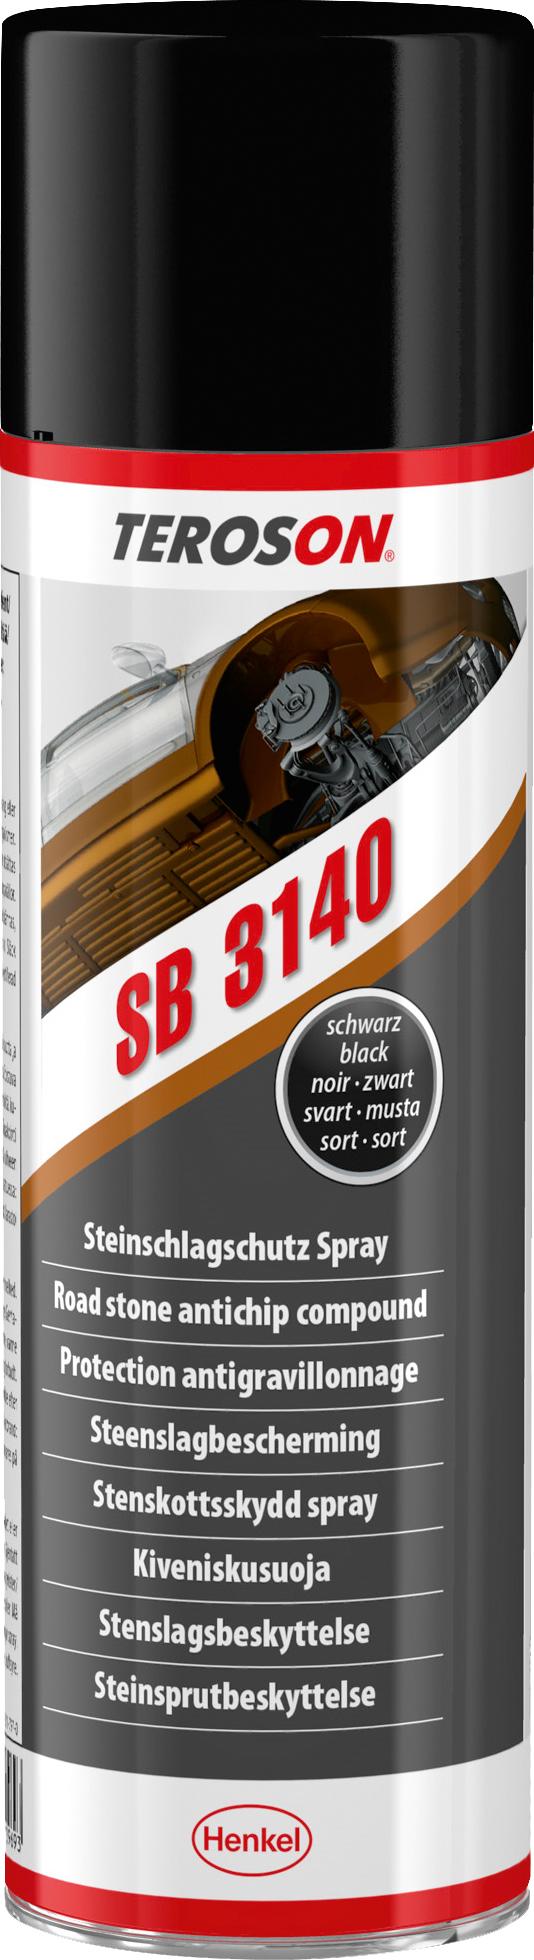 steinschlagschutz teroson sb 3140 fh herren ag. Black Bedroom Furniture Sets. Home Design Ideas